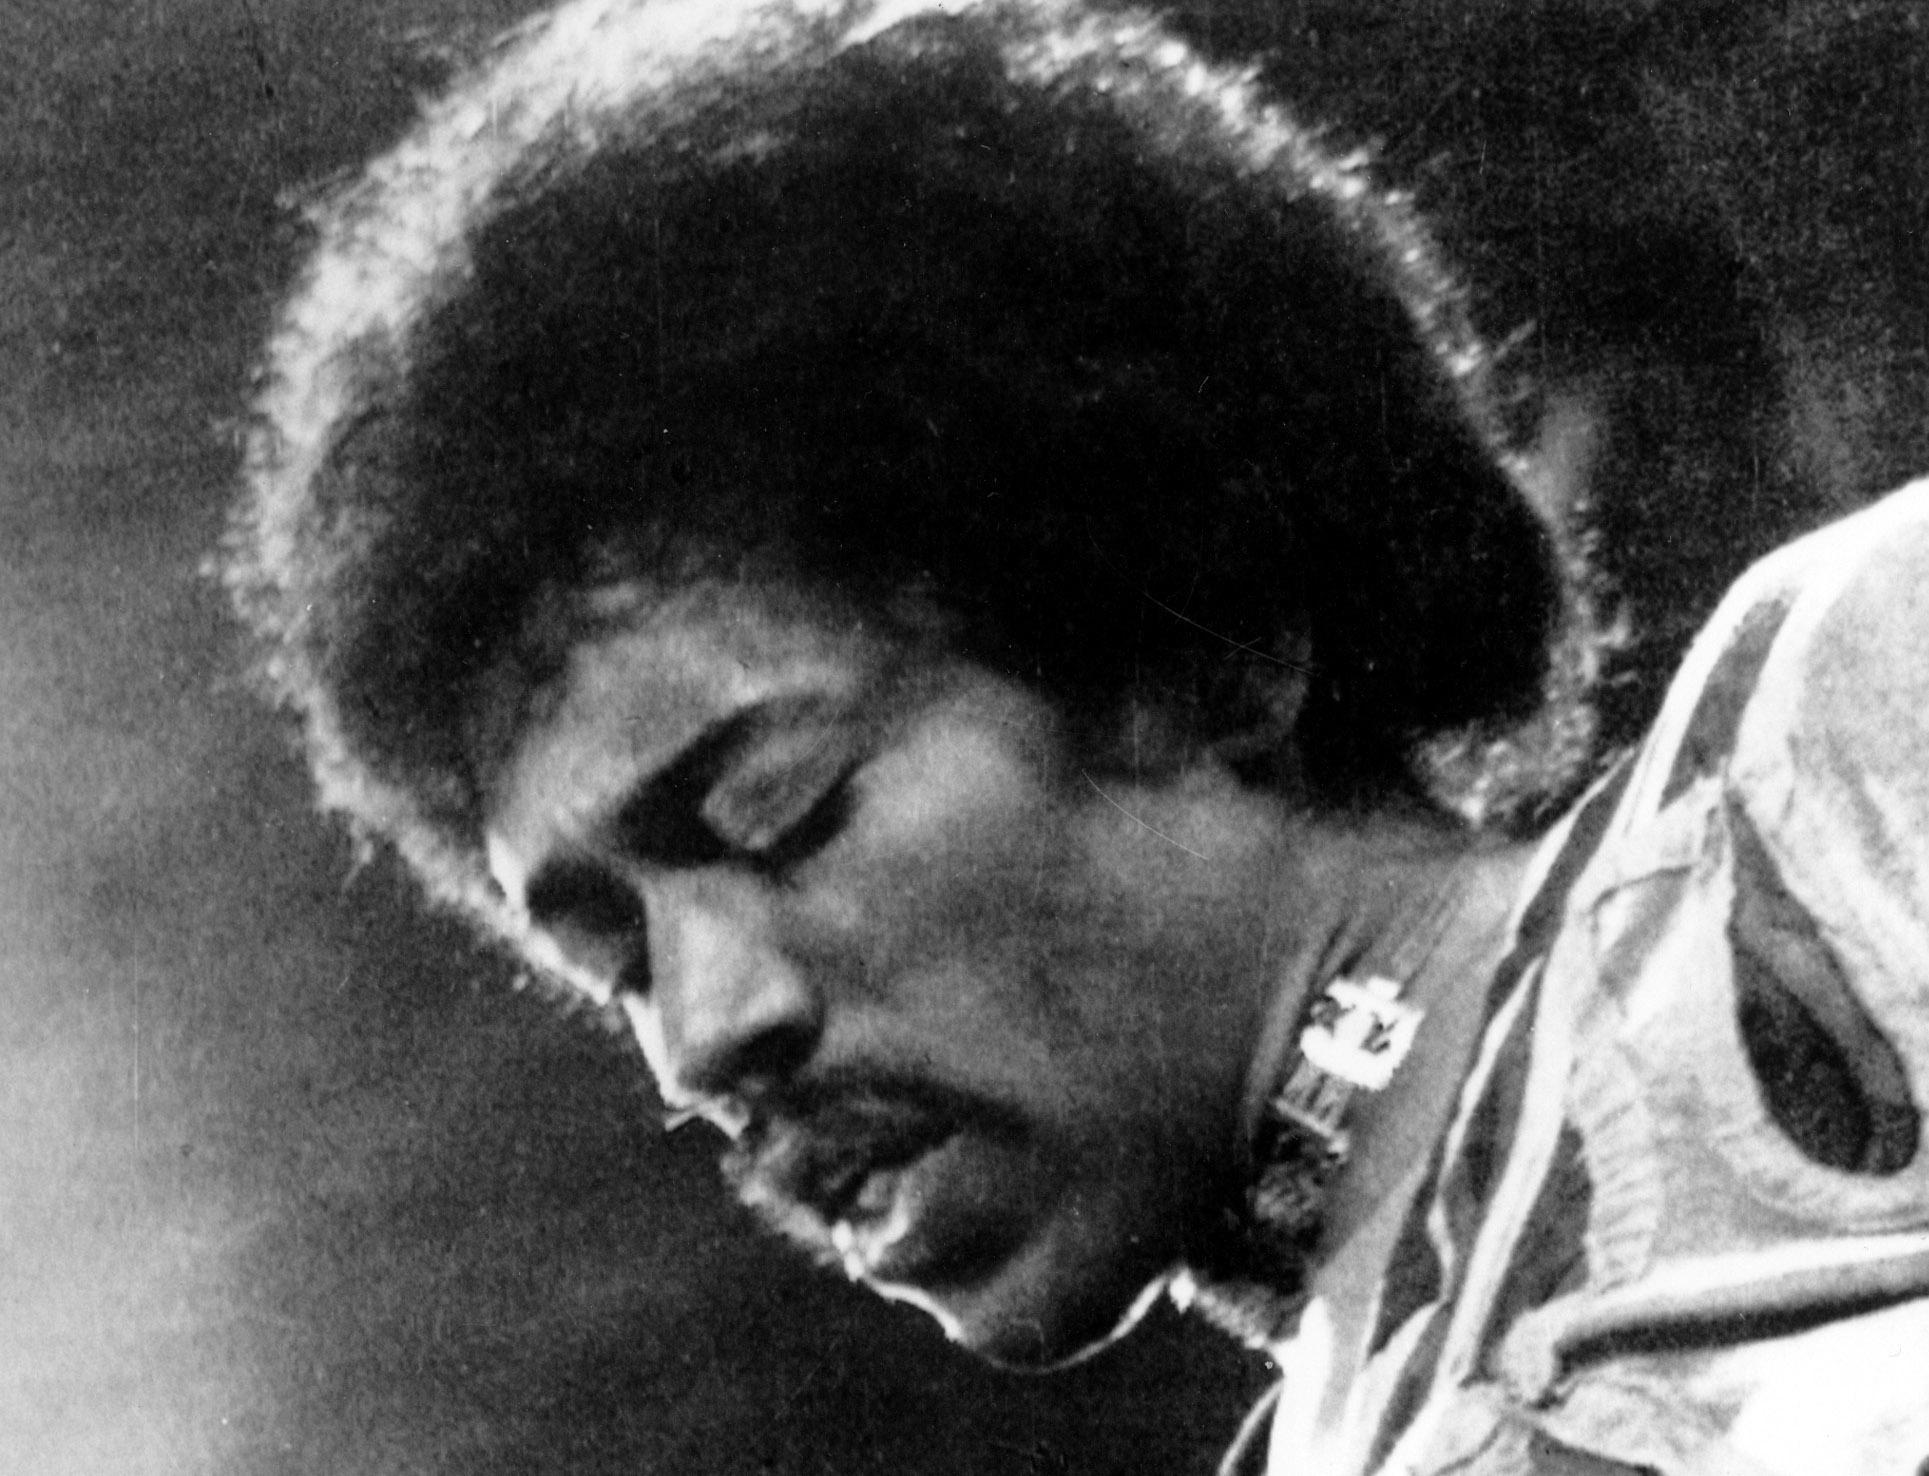 Jimi Hendrix High Definition Wallpapers